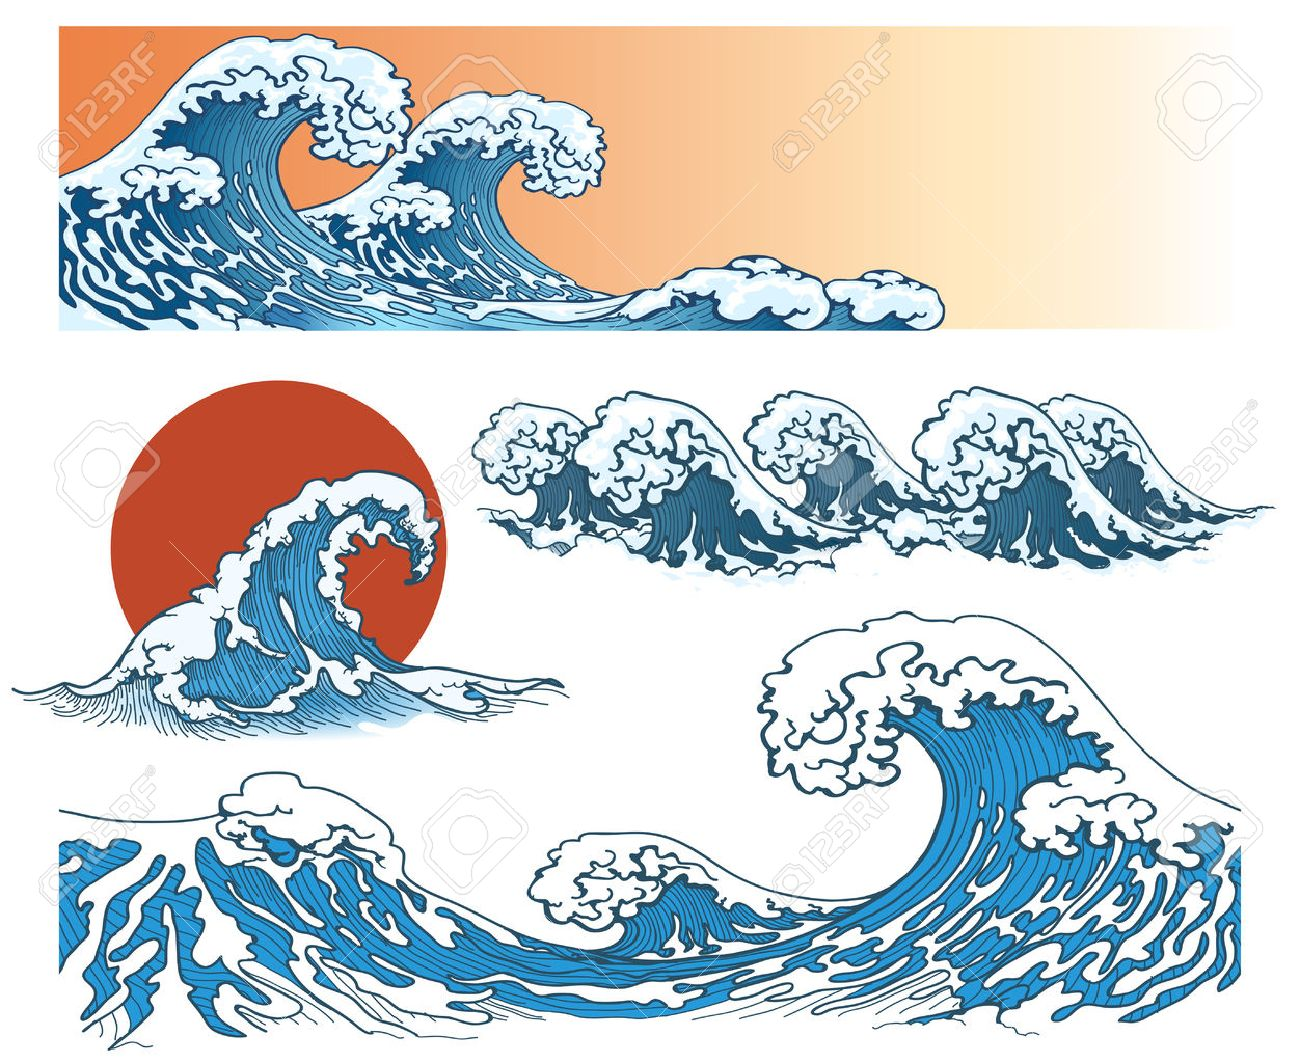 Waves in japanese style. Sea wave, ocean wave splash, storm wave. Vector illustration - 52208554